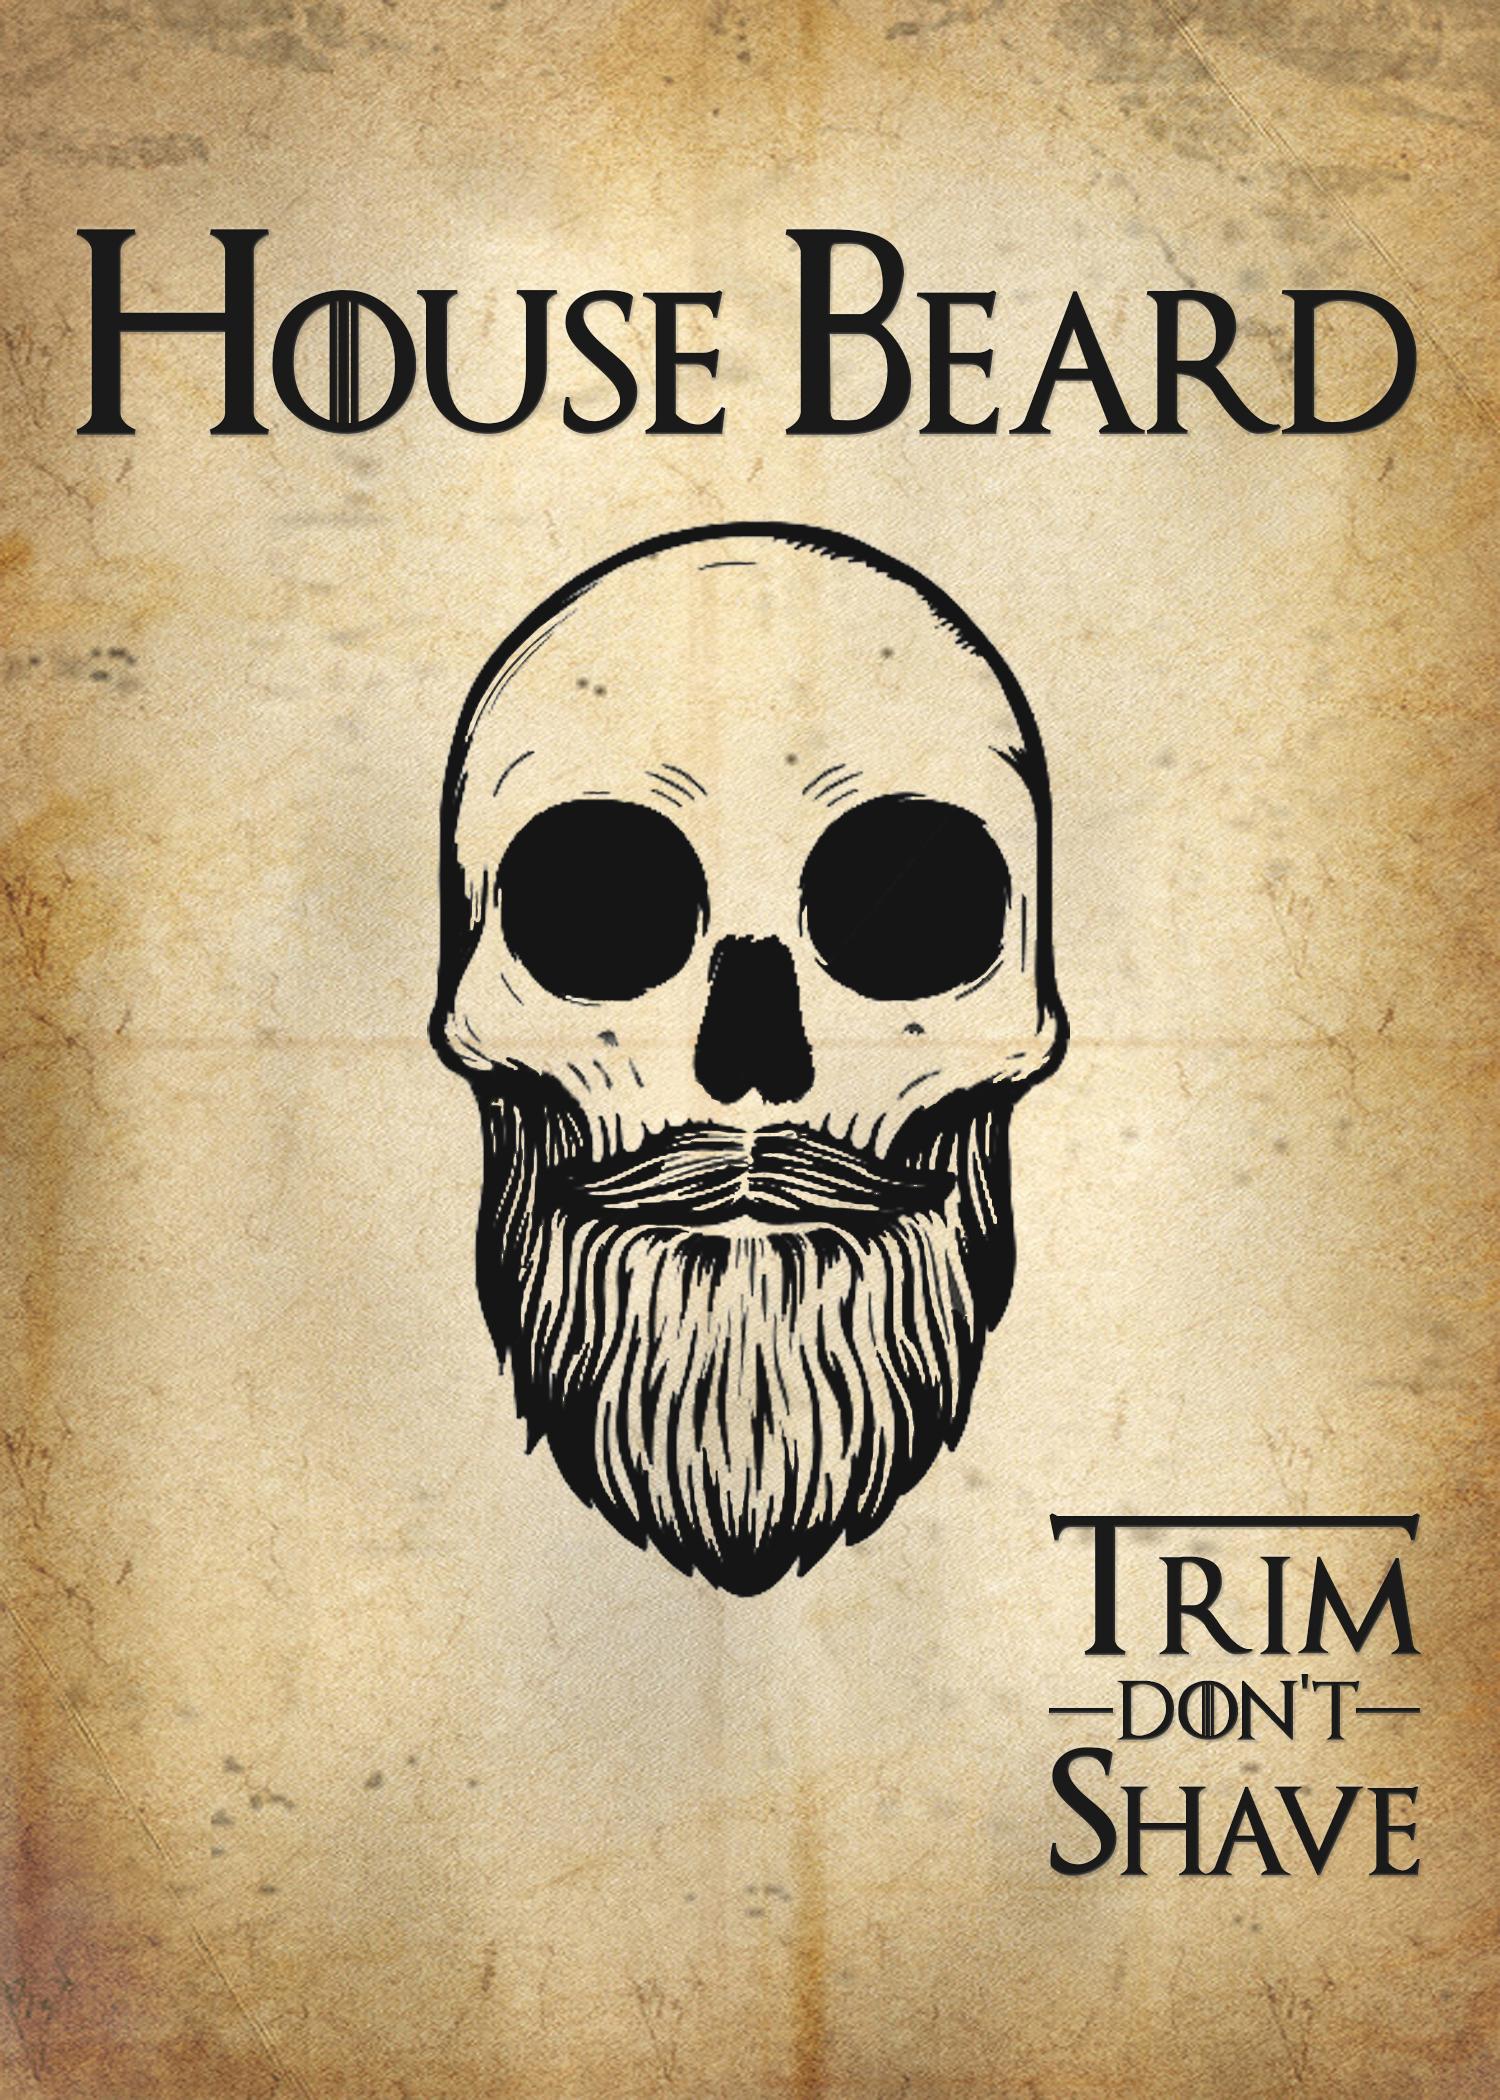 House Beard sigil